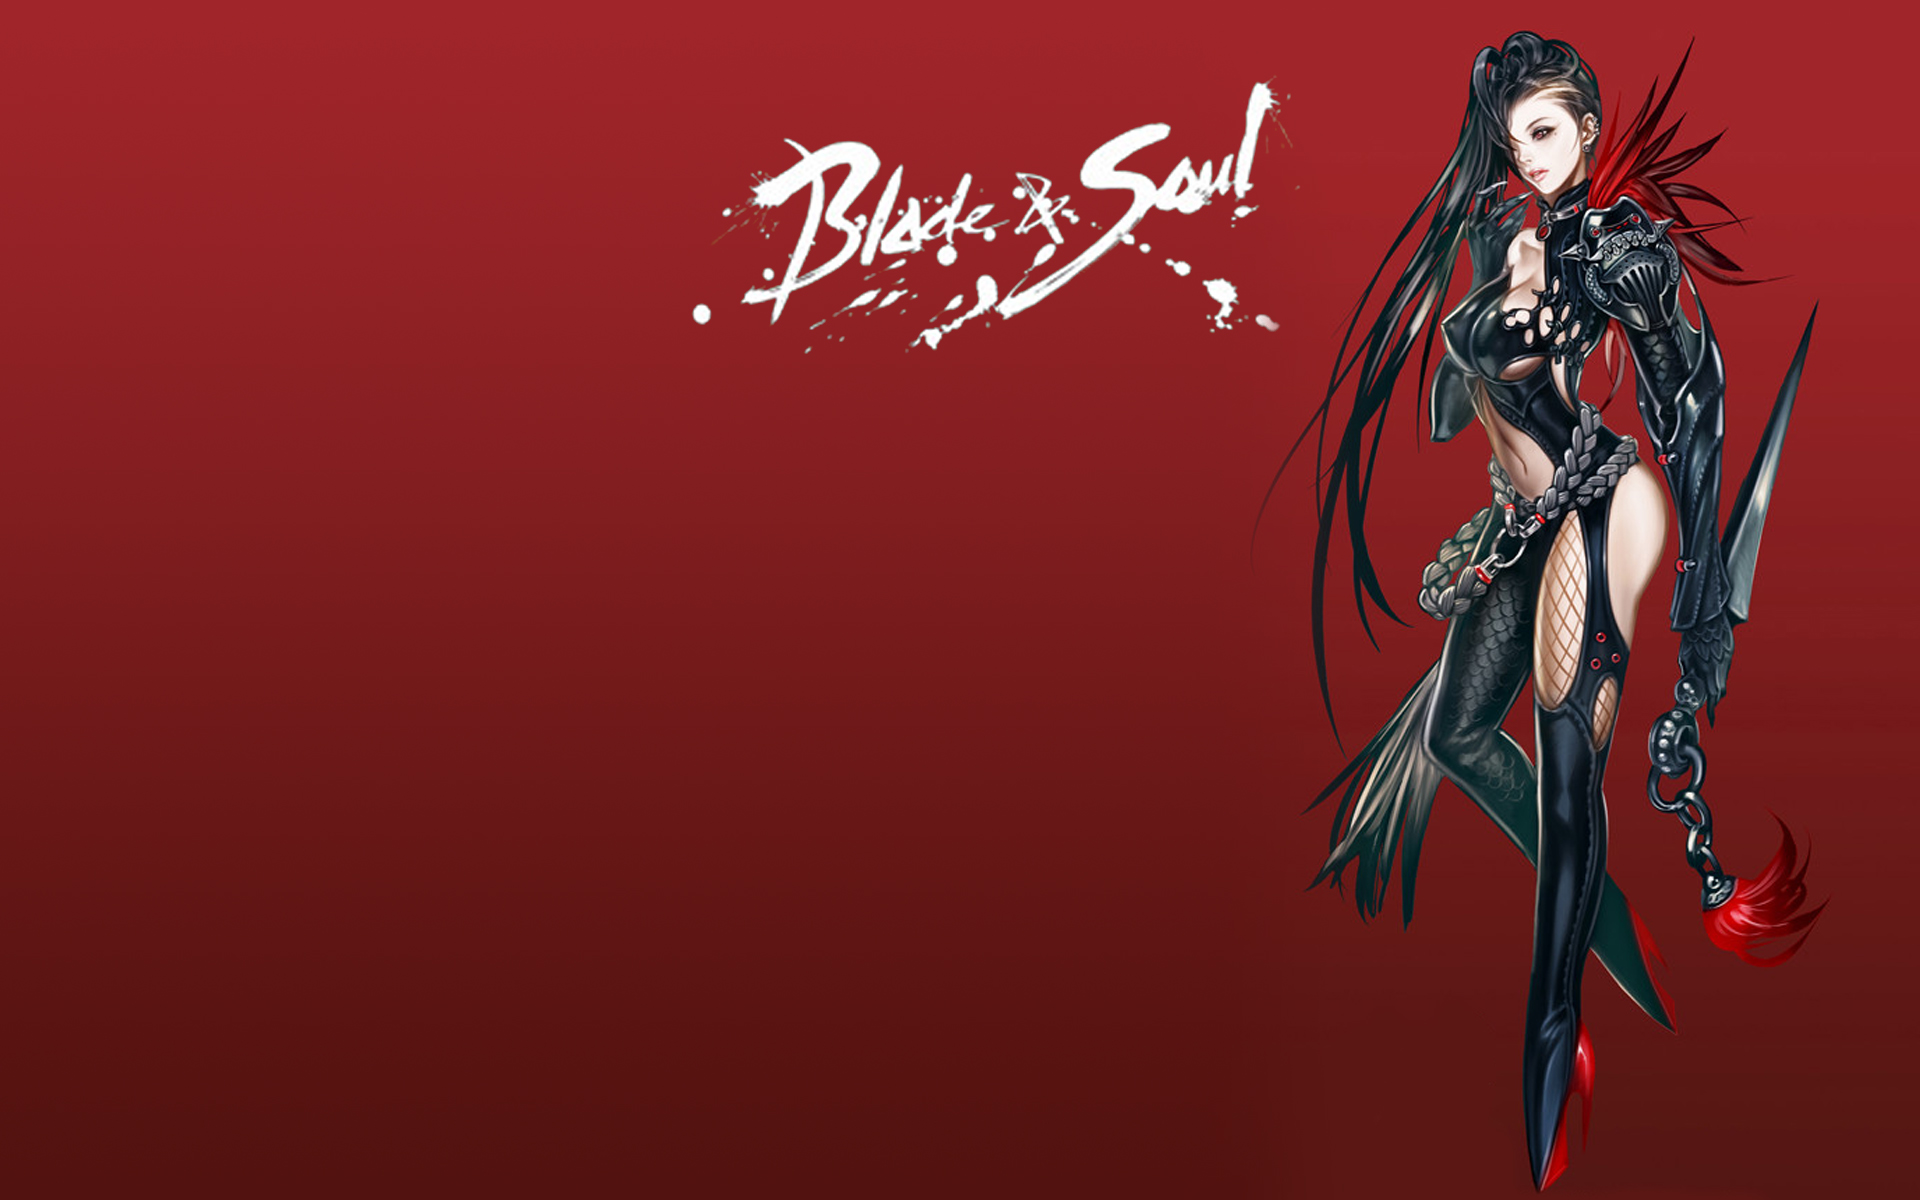 Blade & Soul annonce sa bêta fermée en vidéo